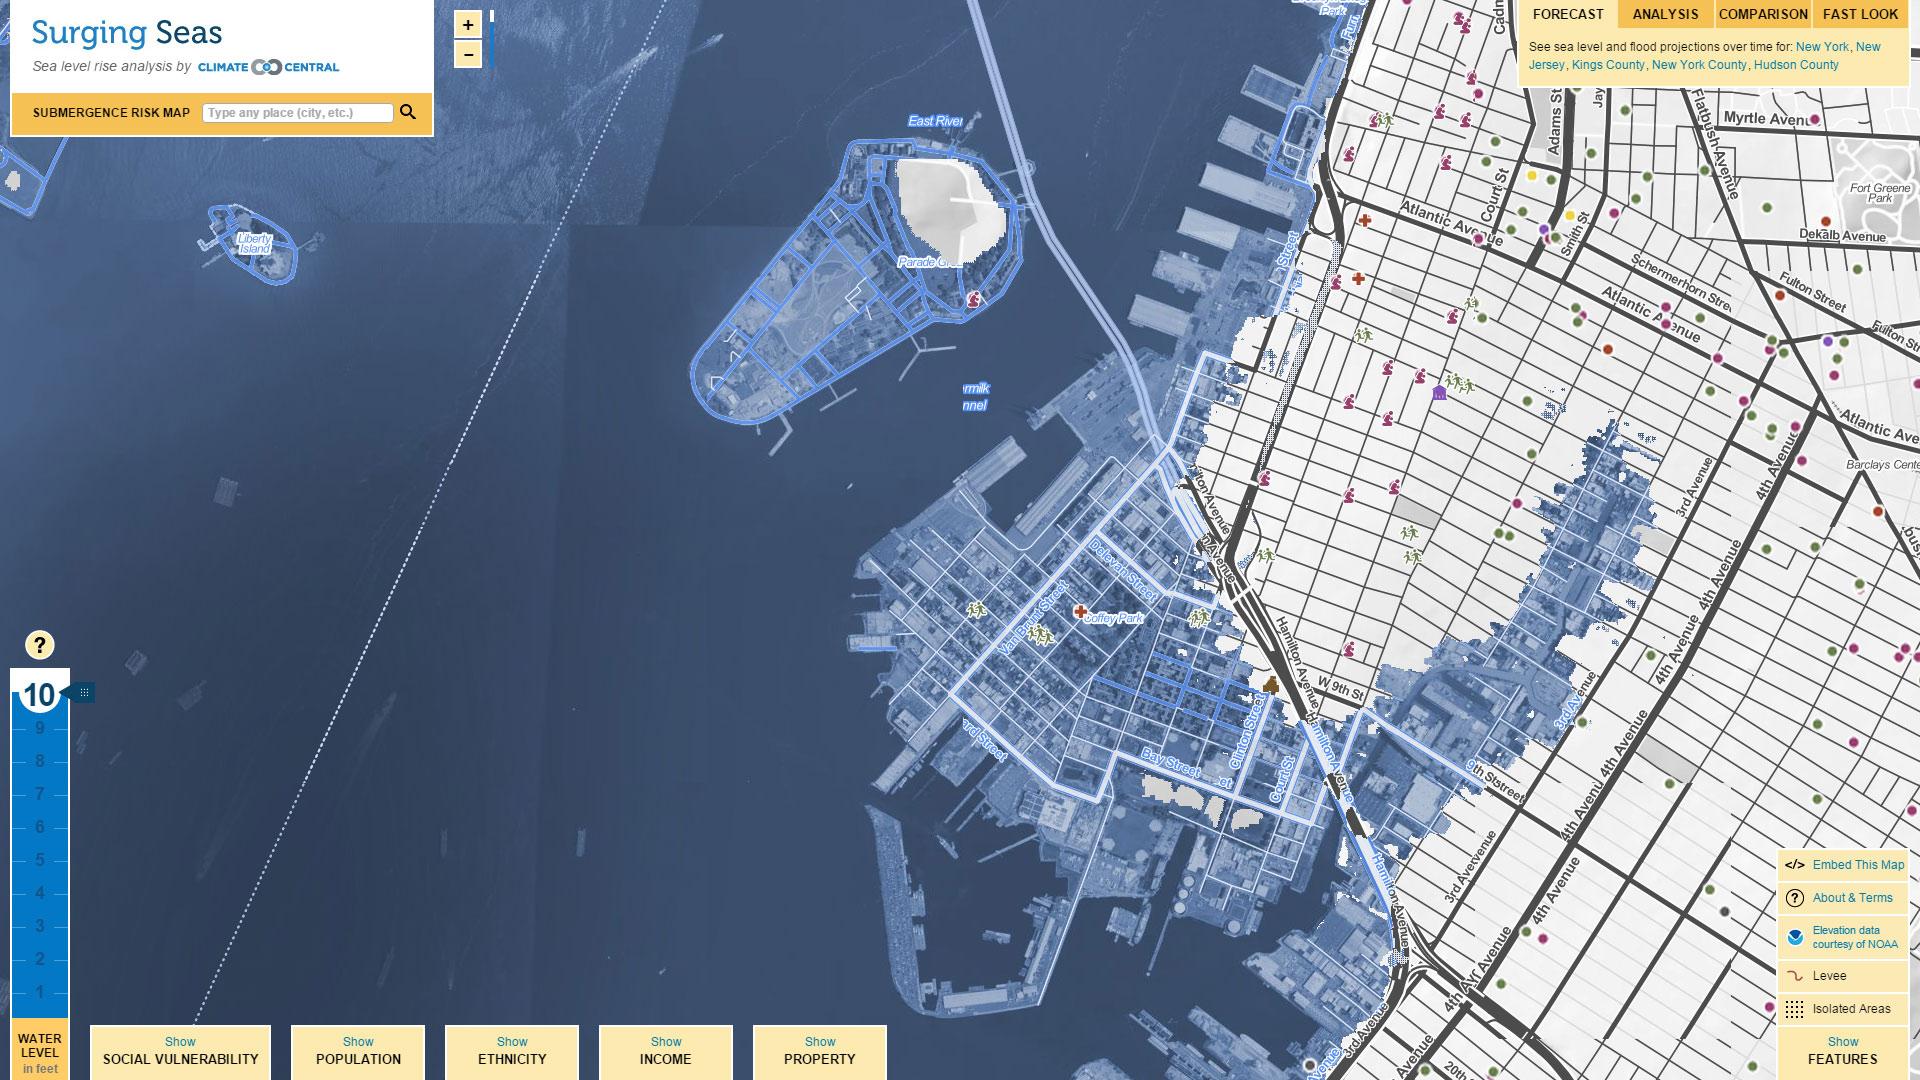 surging-seas_gov-island-red-hook_10ft